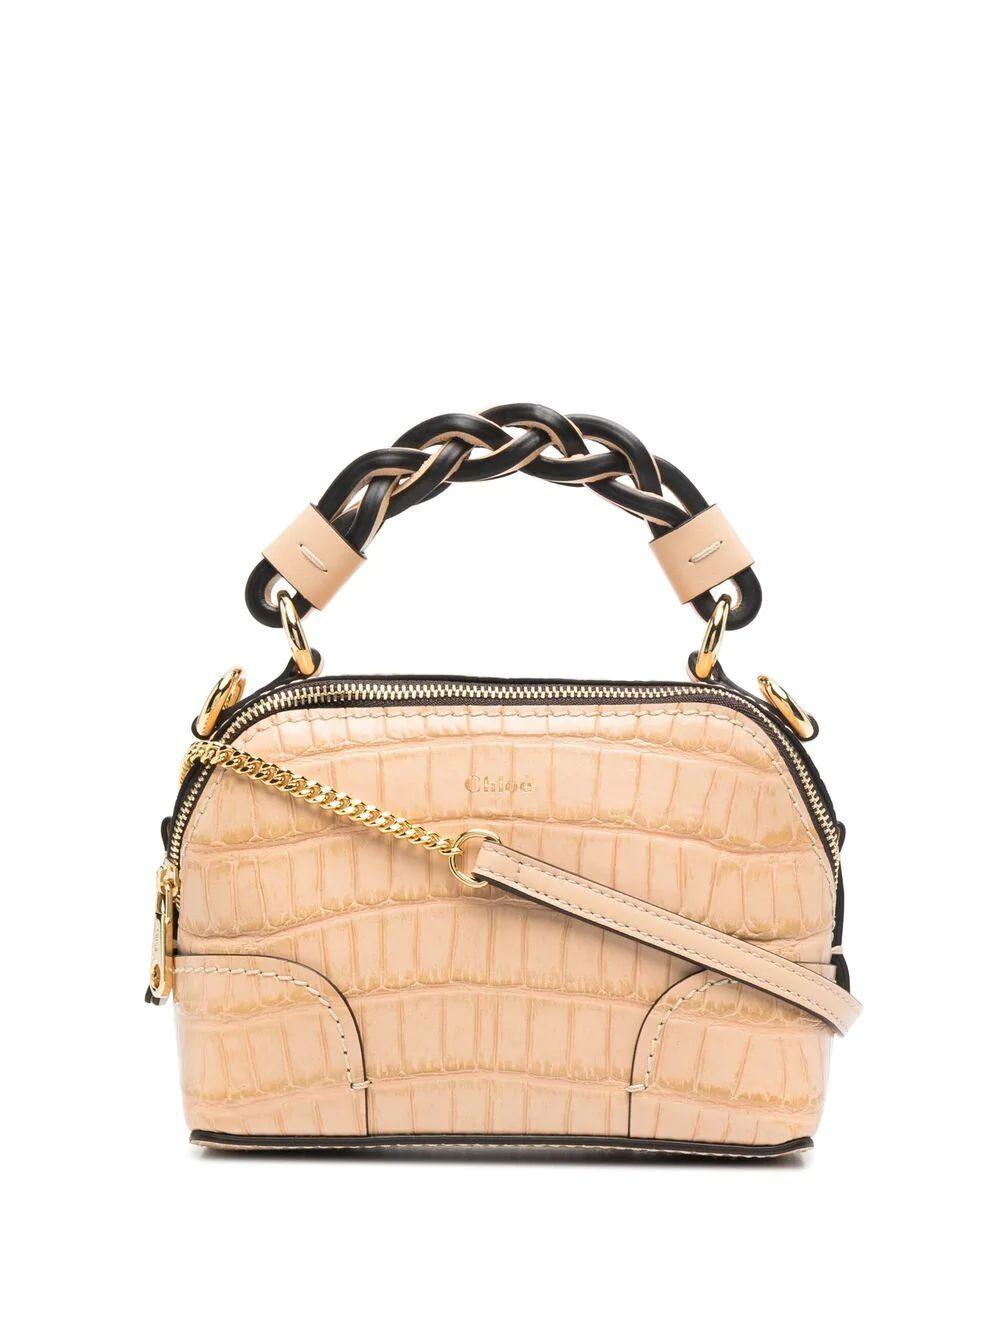 Mini Daria Croc Bag Item # CHC21US362E57